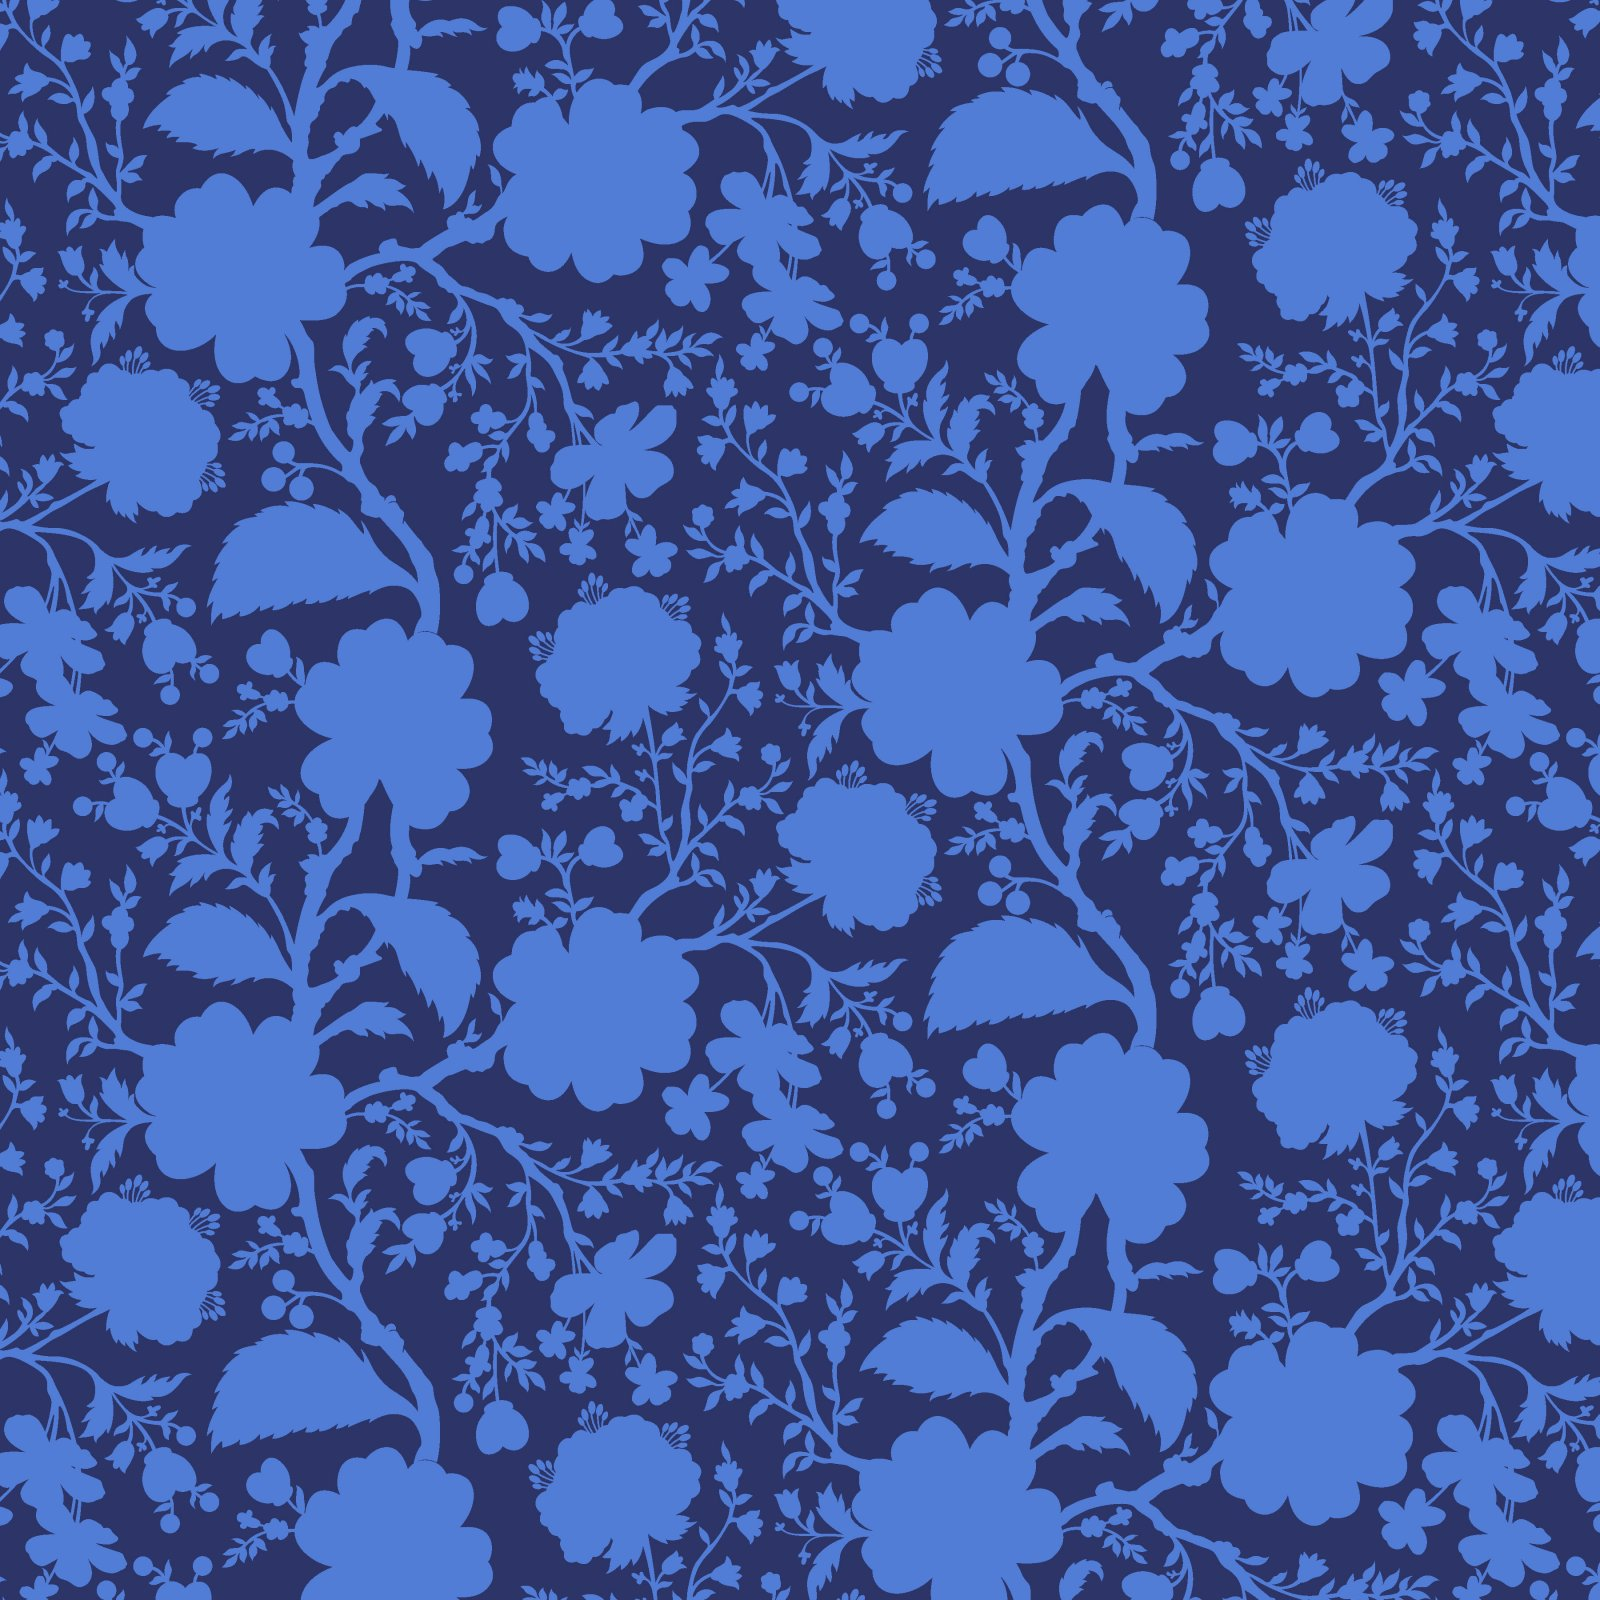 PWTP149.ANEMONE - Tula Pink Wildflower - Anemone